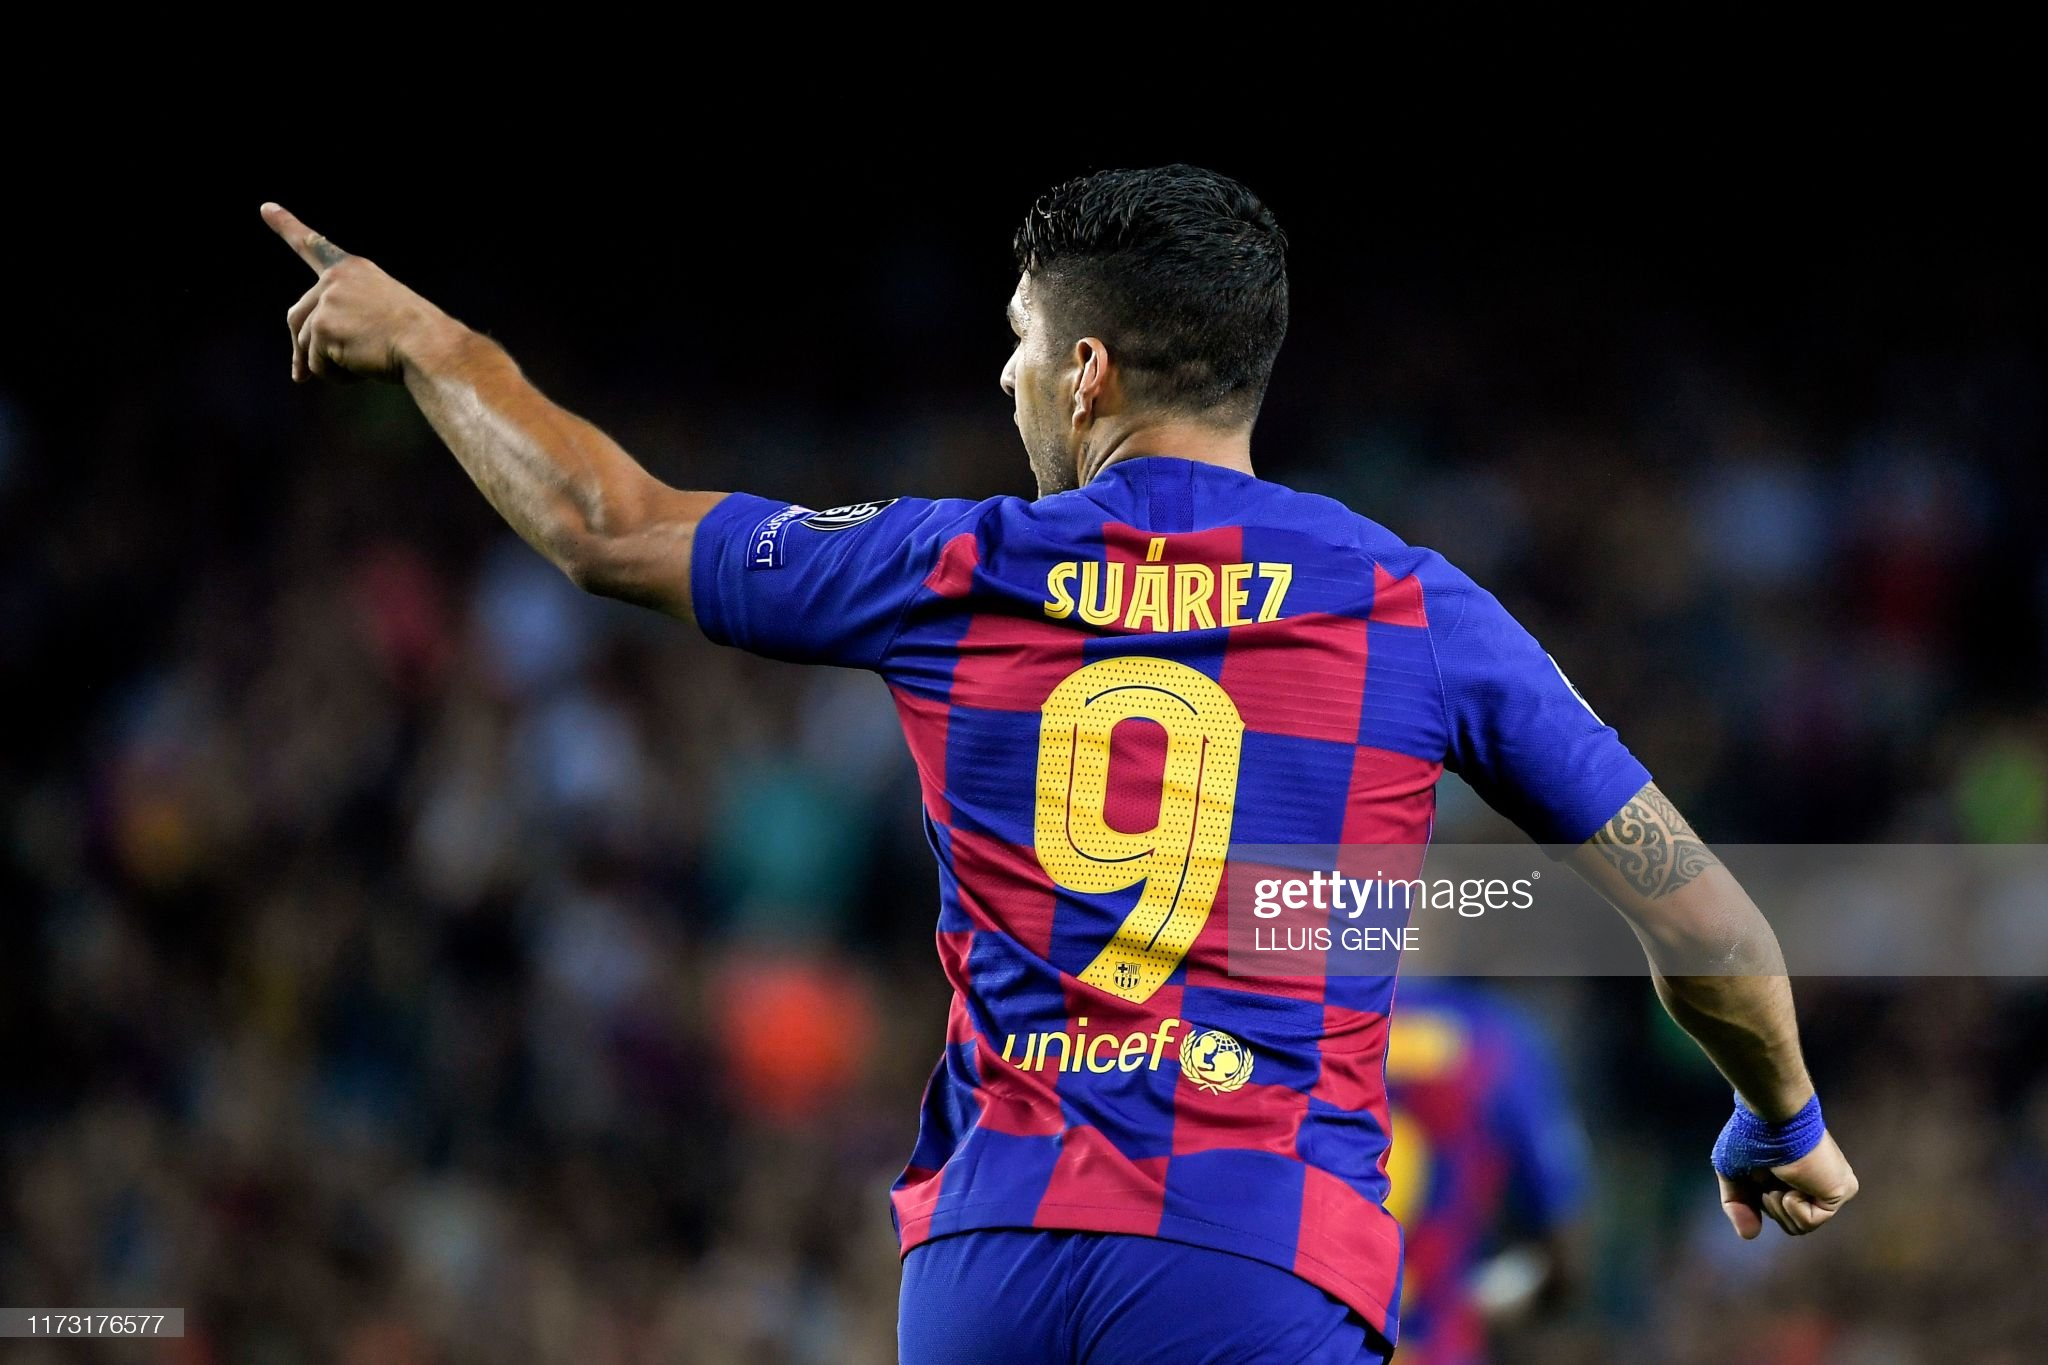 صور مباراة : برشلونة - إنتر 2-1 ( 02-10-2019 )  Barcelonas-uruguayan-forward-luis-suarez-celebrates-after-scoring-a-picture-id1173176577?s=2048x2048